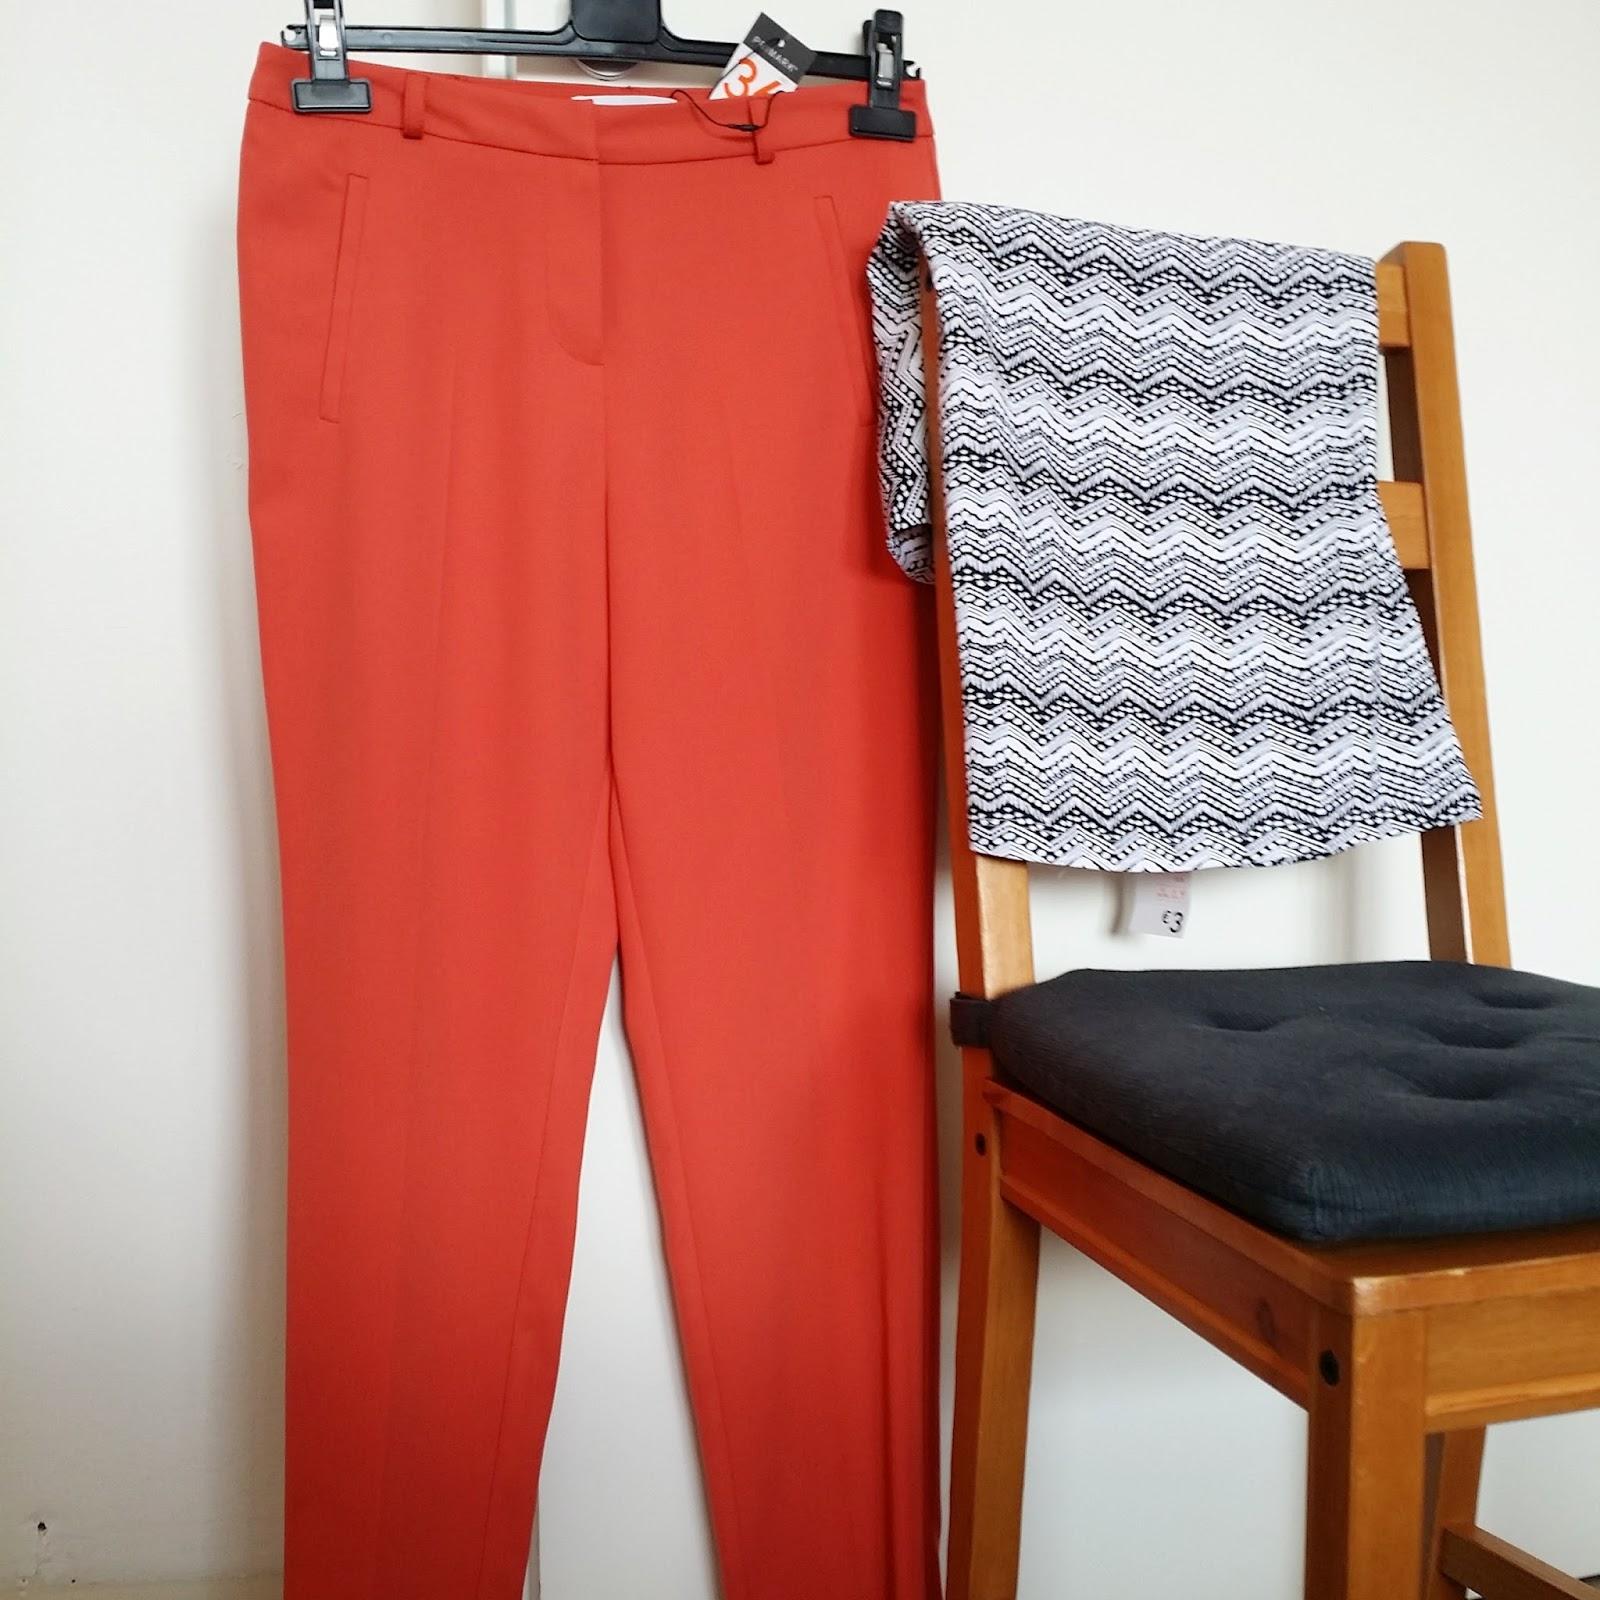 pantaloni-primark-estate